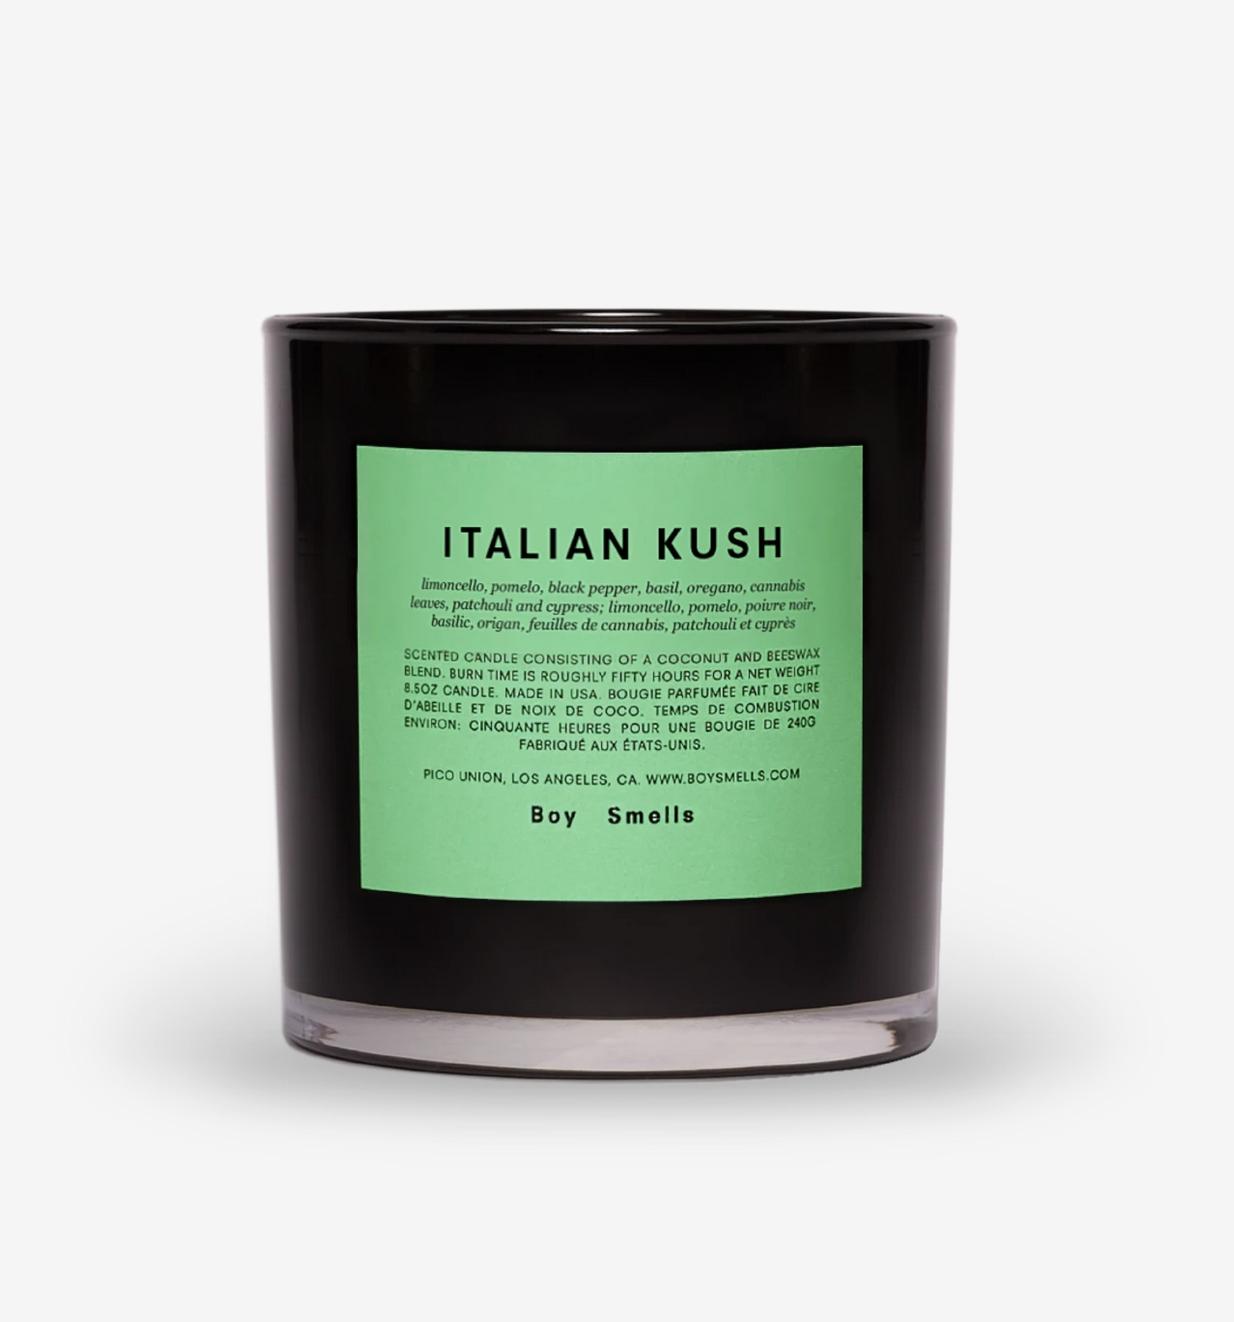 Boy Smells Boy Smells - Italian Kush